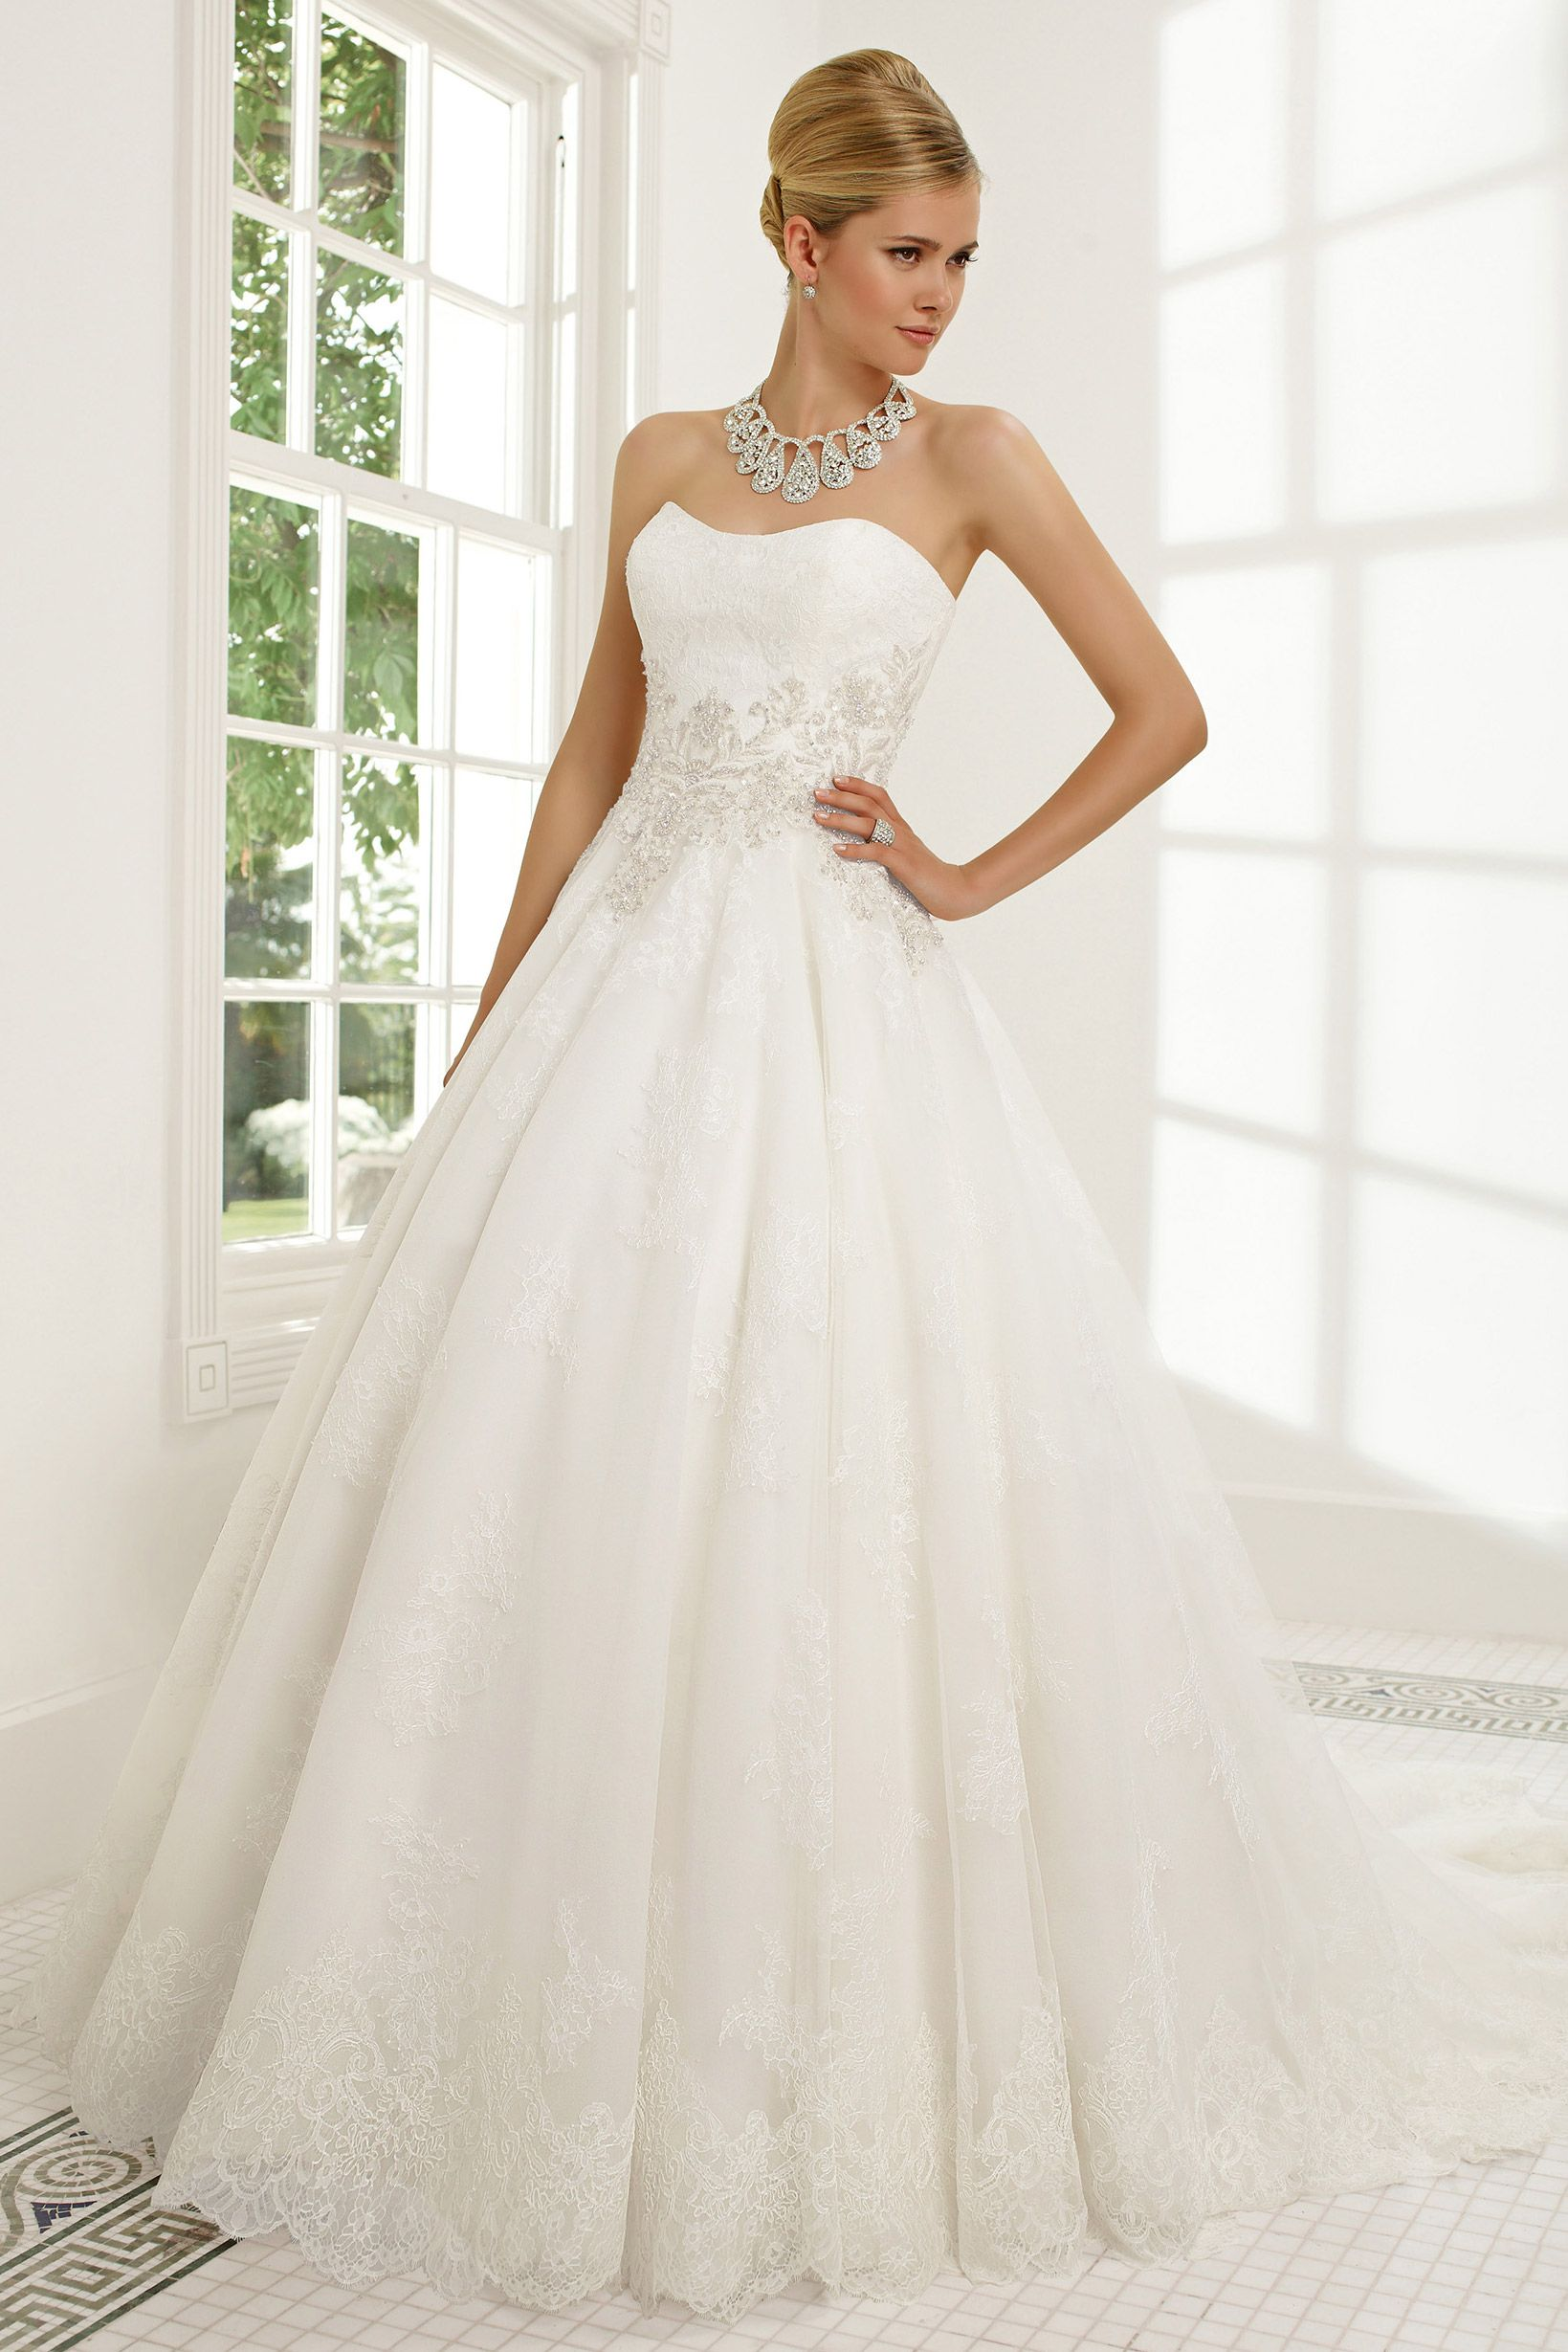 Ronald Joyce Ballgown Princess Wedding Dress Guides For Brides Wedding Dresses Wedding Dresses Beaded Wedding Dress Guide [ 2458 x 1639 Pixel ]